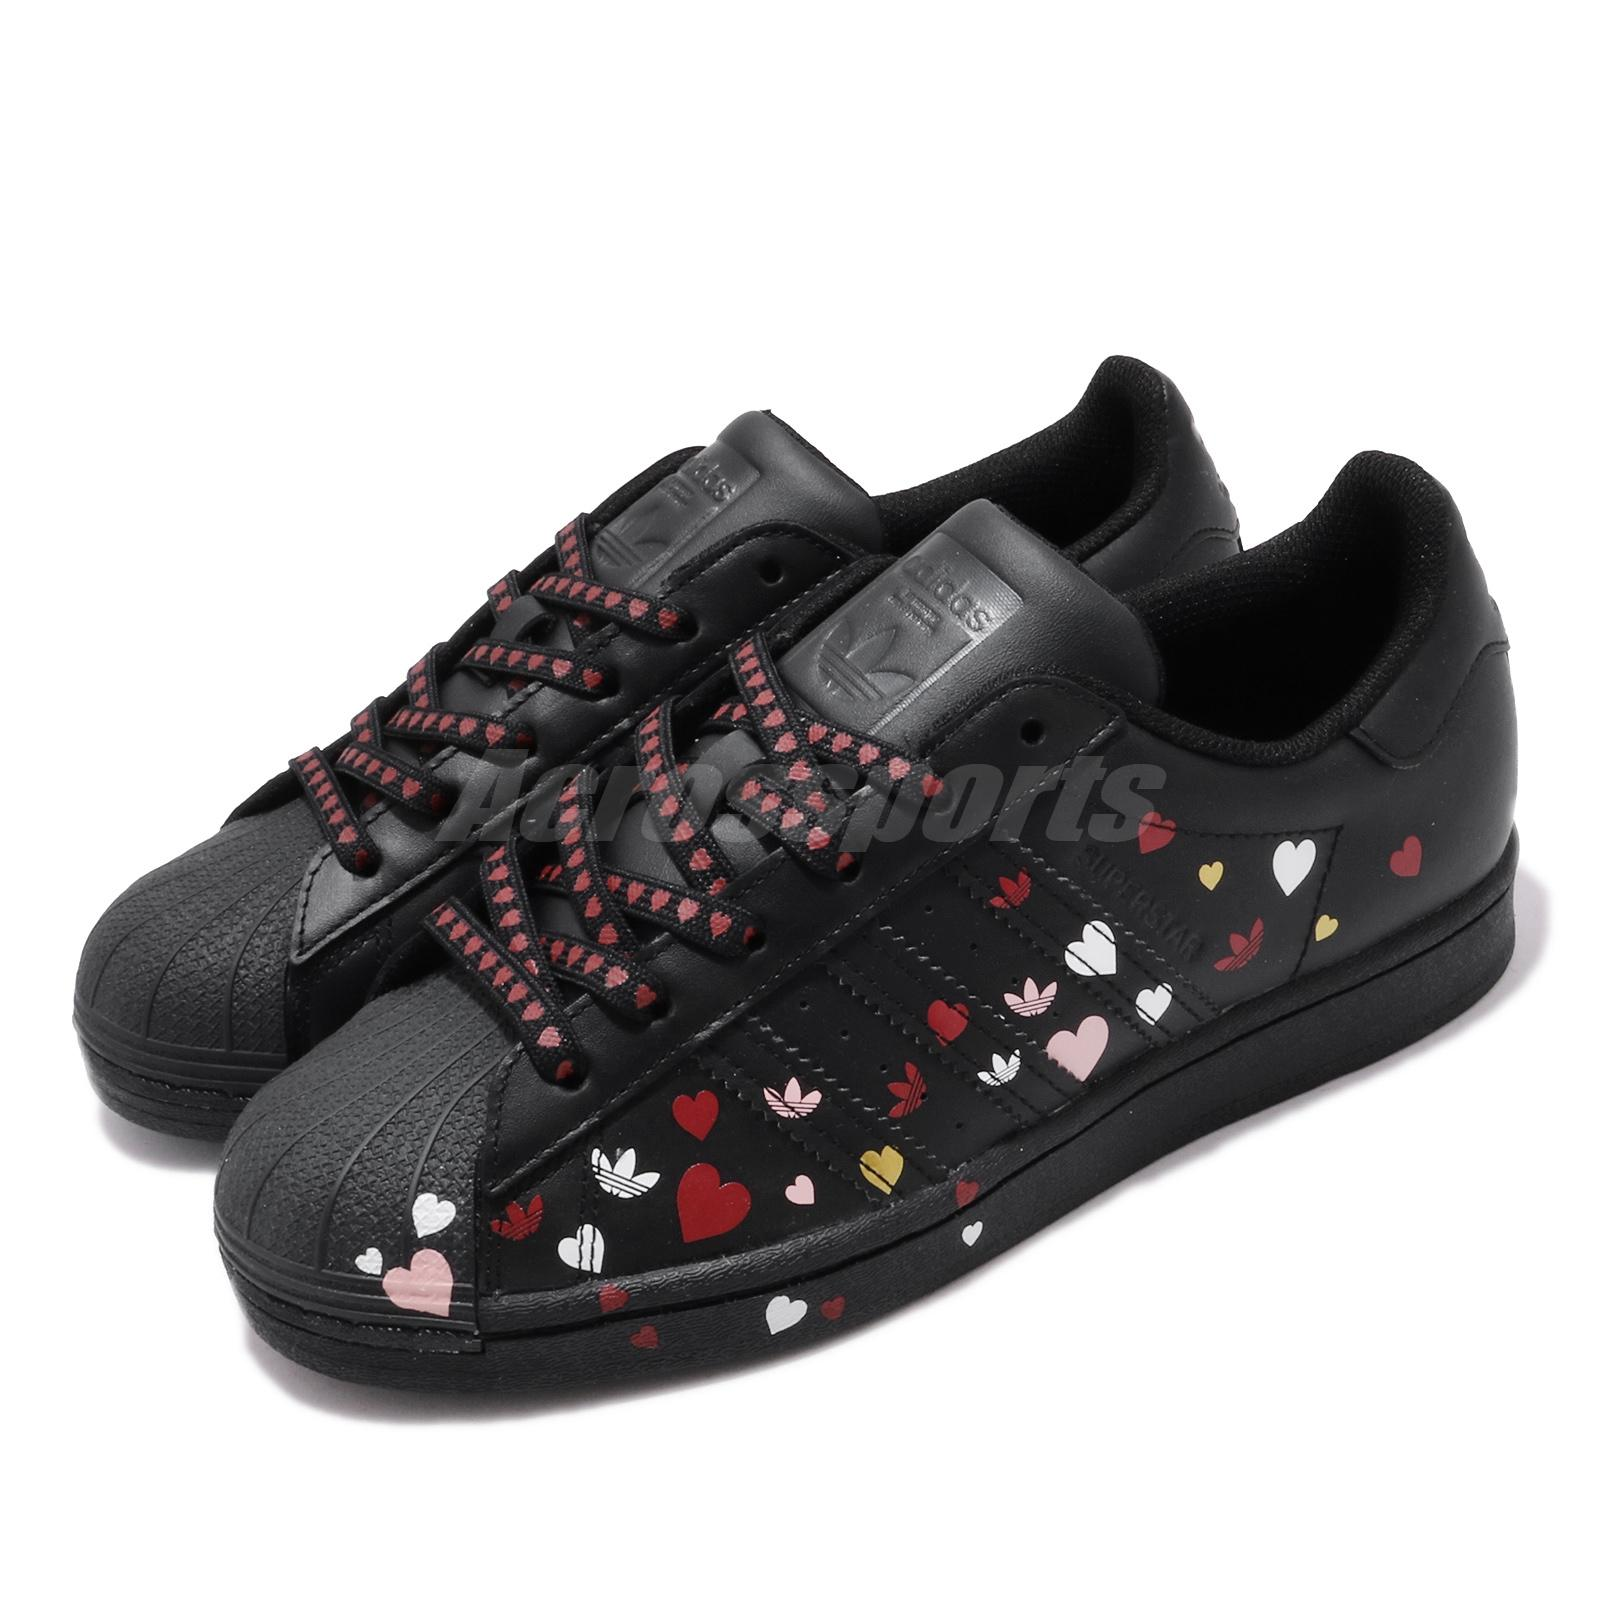 adidas Originals Superstar W Black Pink